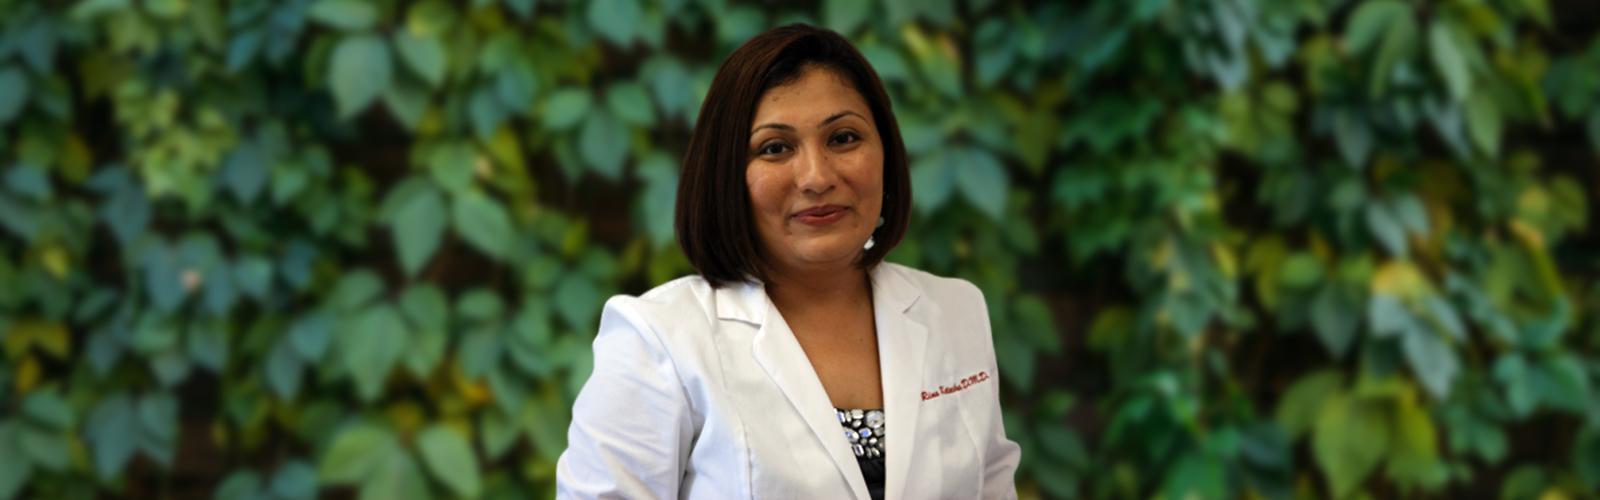 Dr. Rina Kotecha - Mississauga, ON